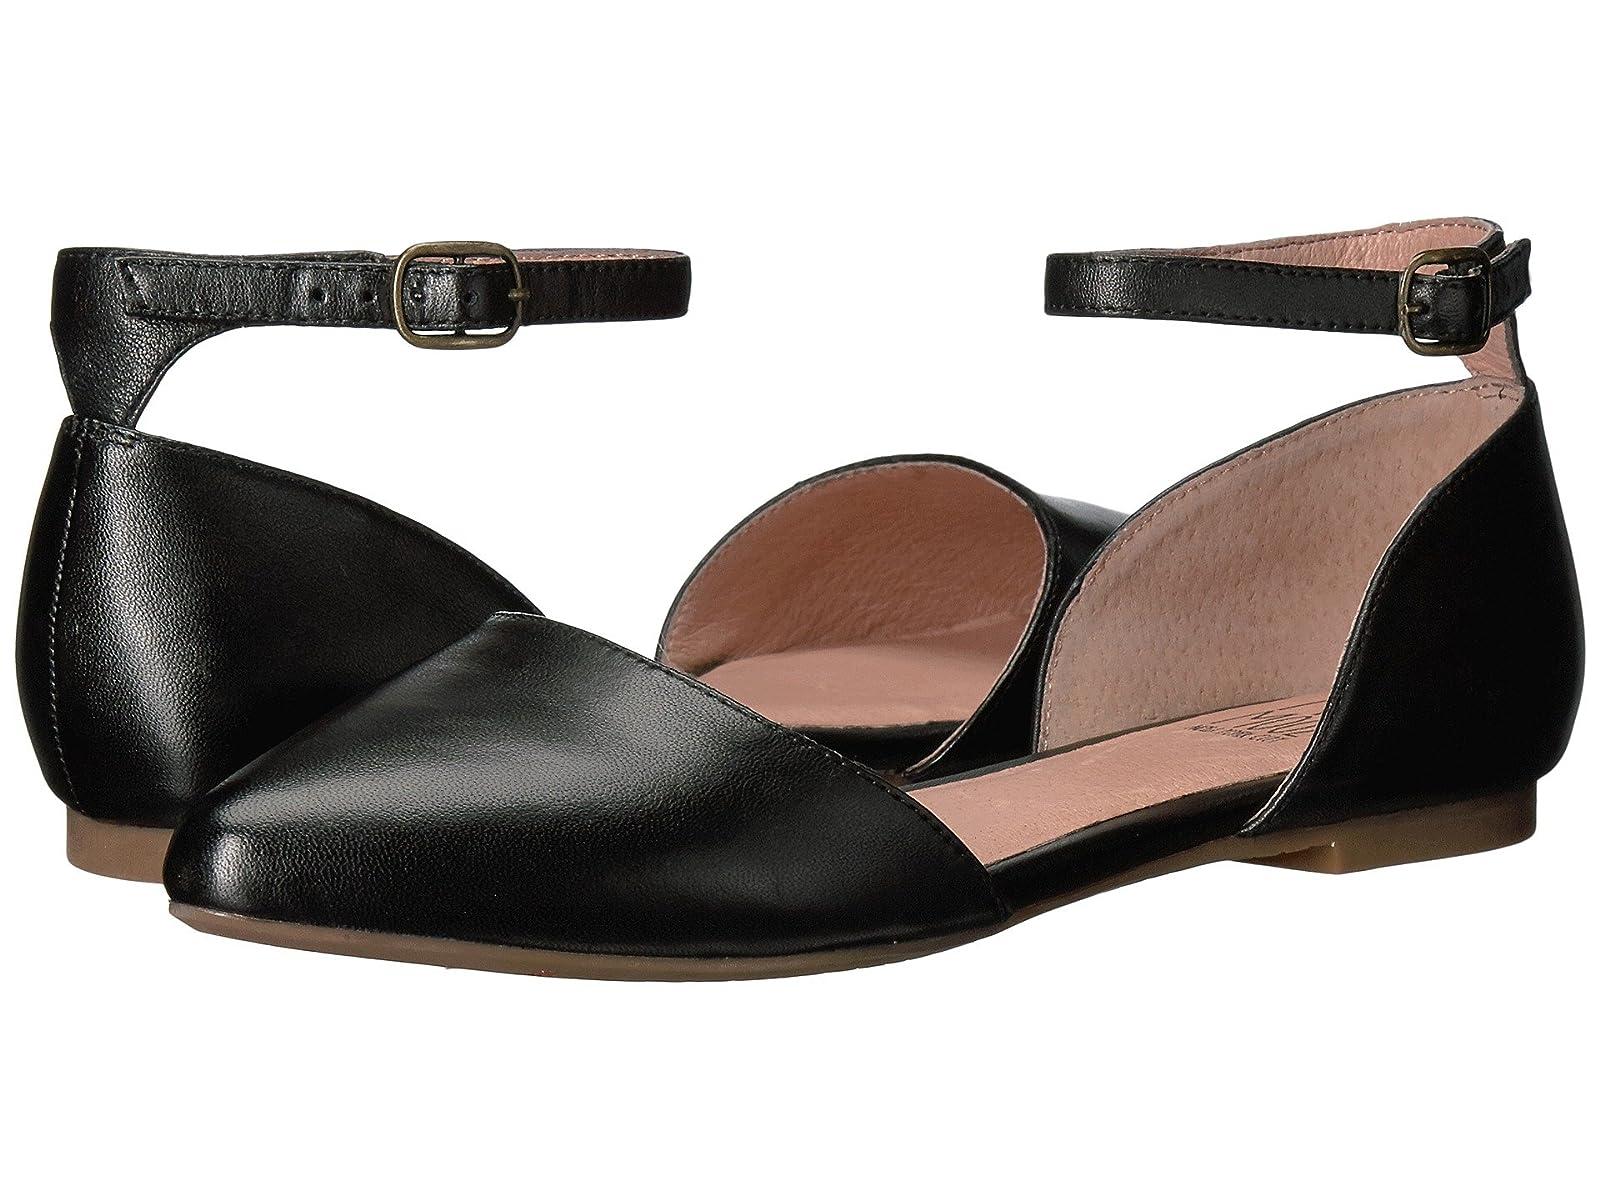 Miz Mooz BeckieCheap and distinctive eye-catching shoes